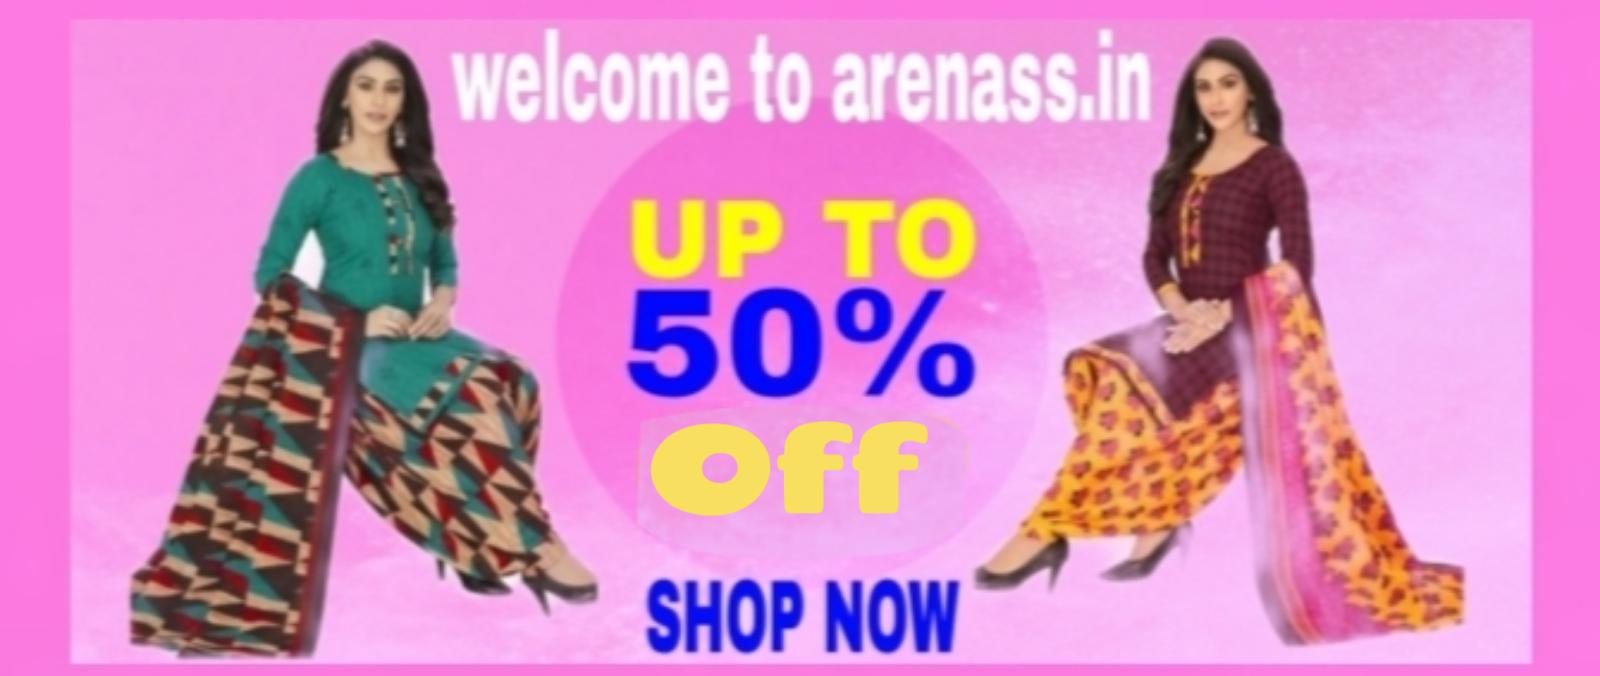 arenass promo